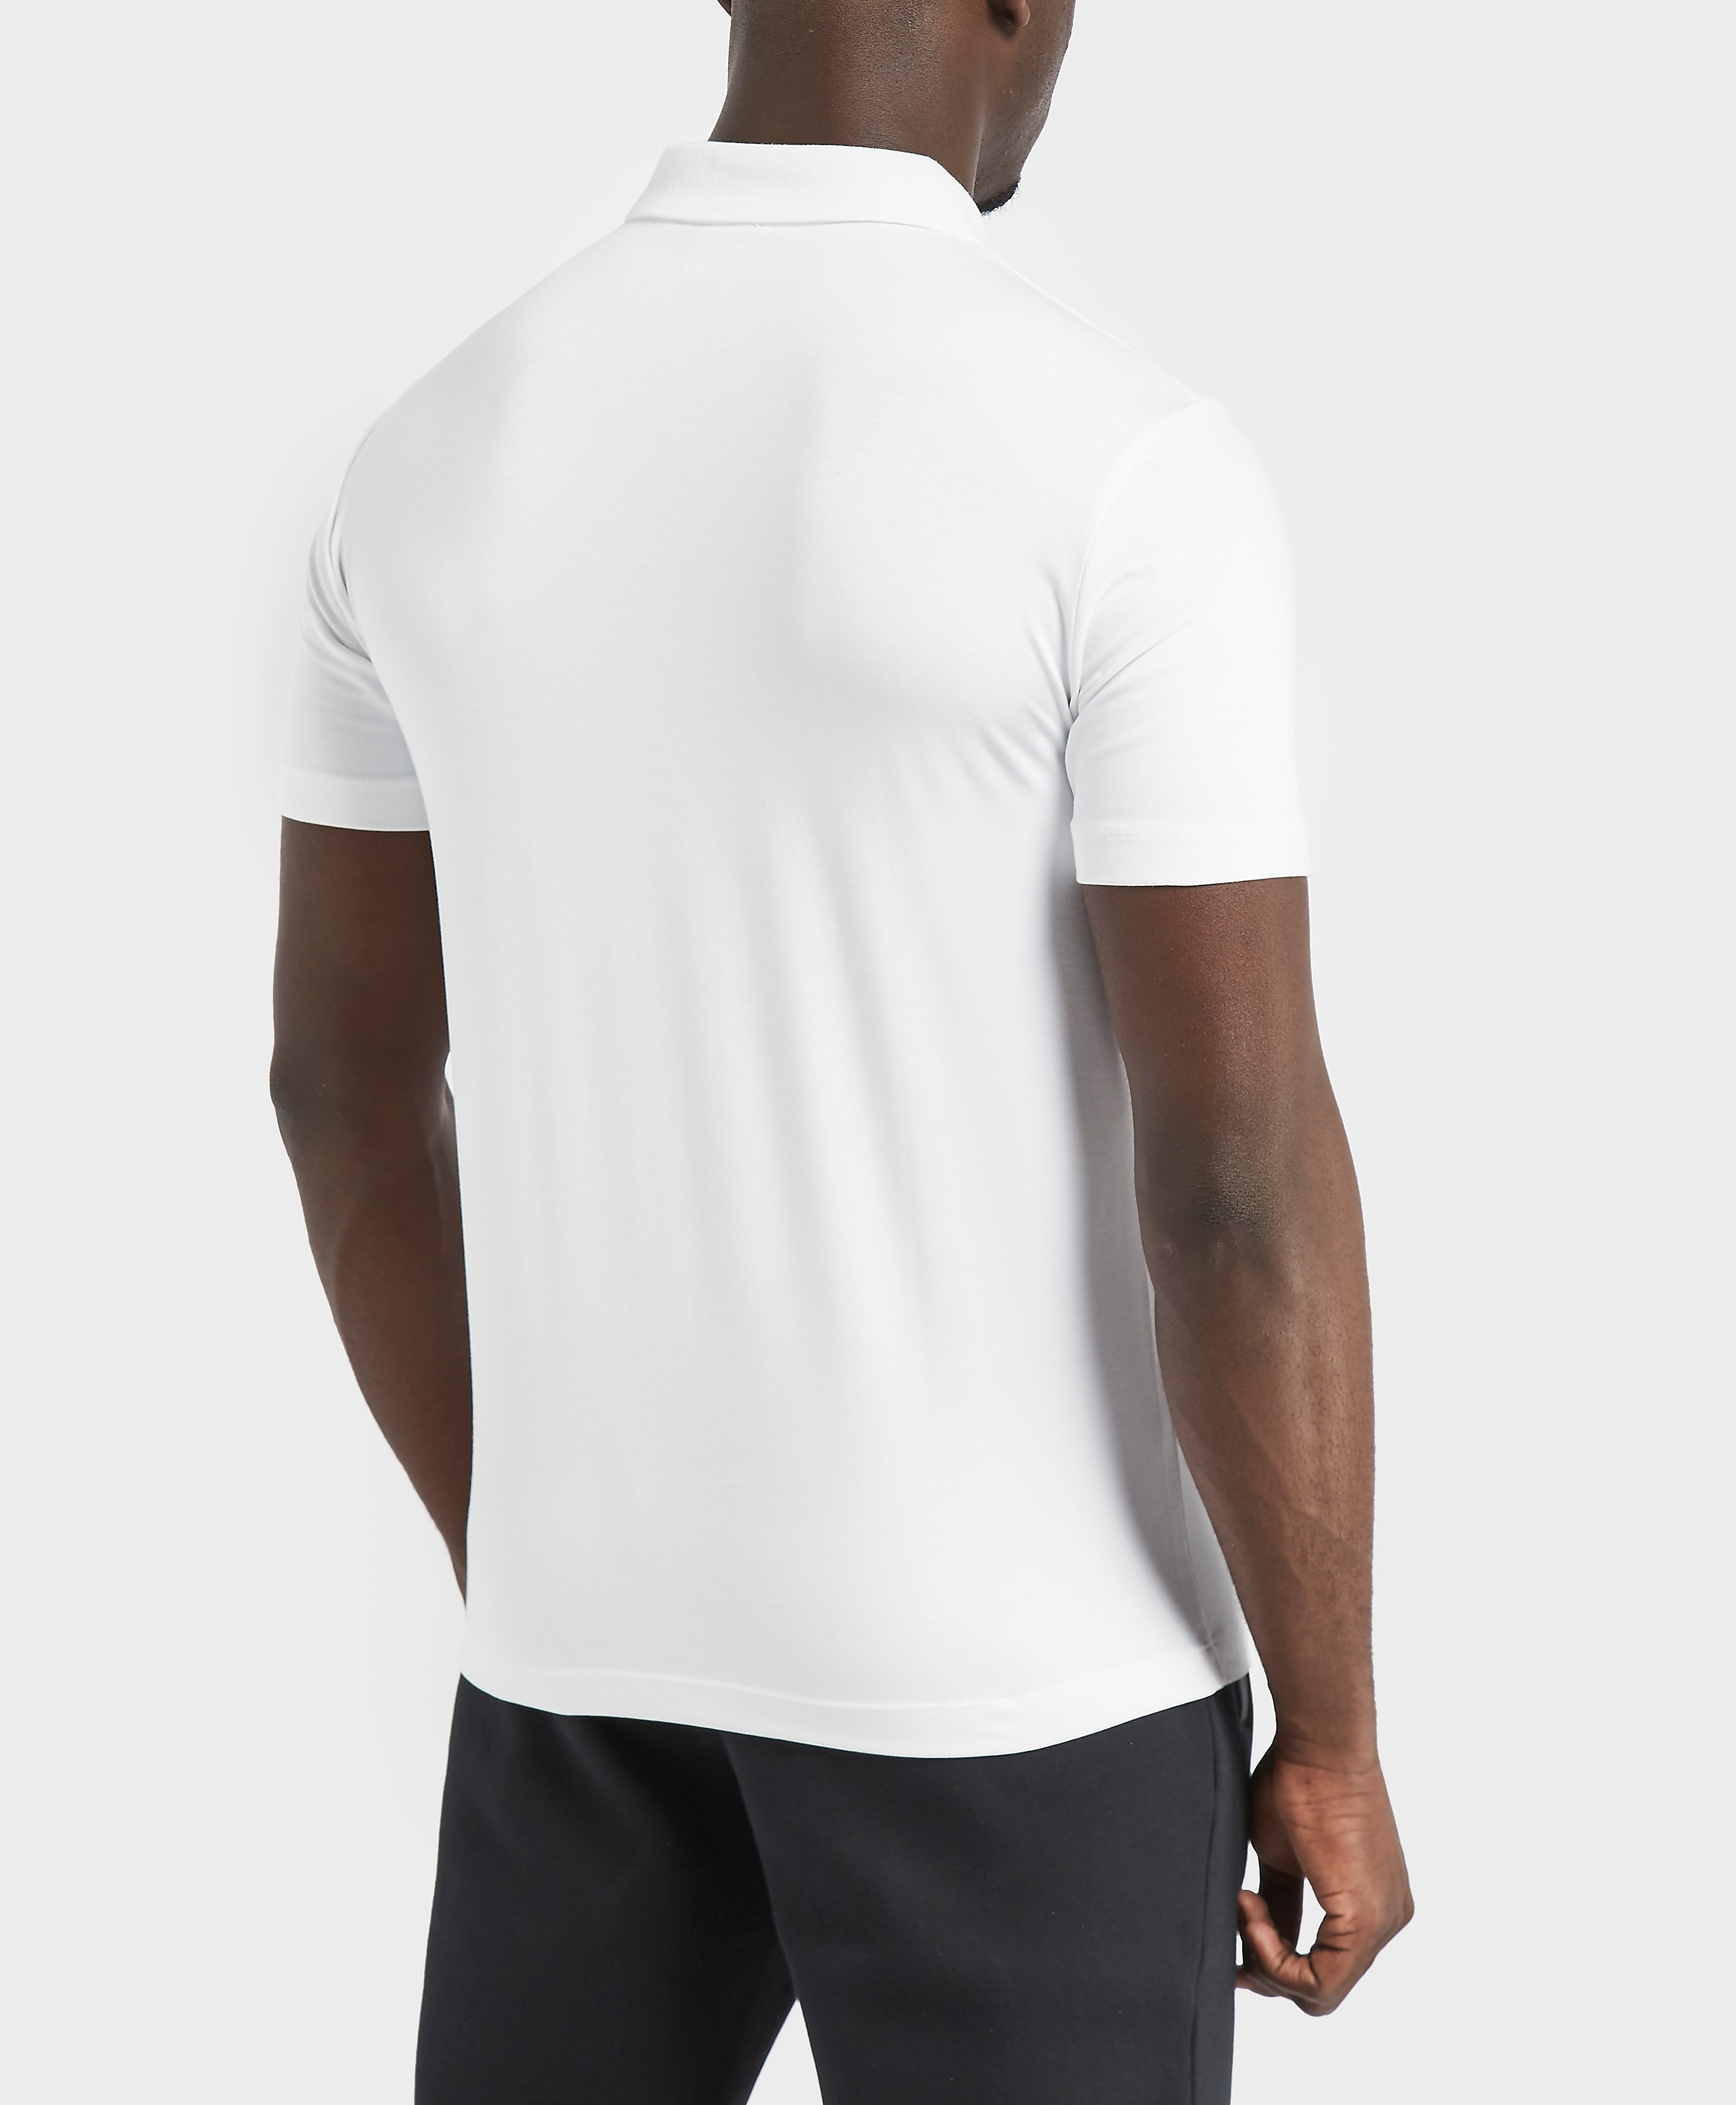 Emporio Armani EA7 Shield Short Sleeve Polo Shirt